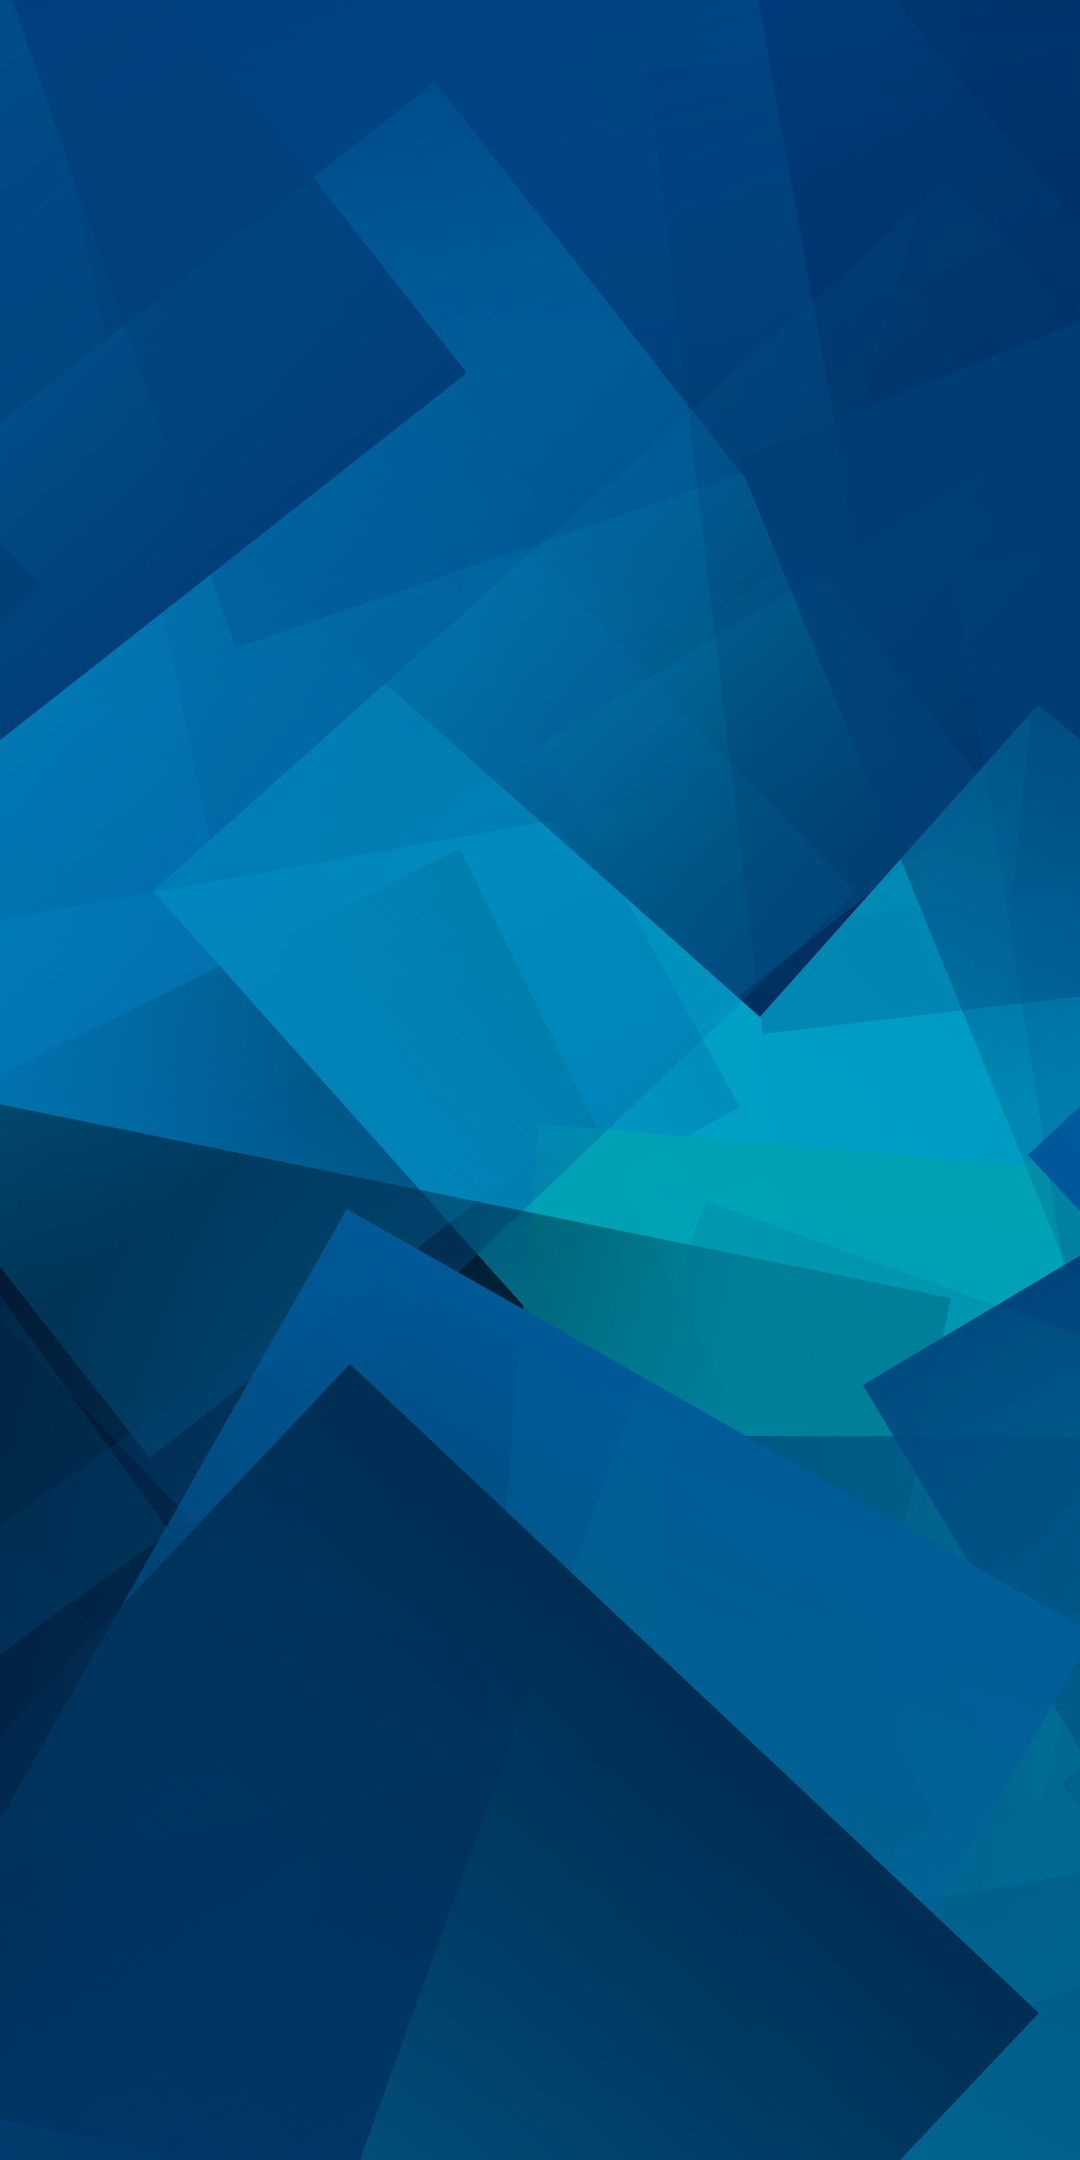 Vo18 Samsung Galaxy 7 Edge Blue Abstract Pattern Blue Abstract Abstract Samsung Galaxy Wallpaper